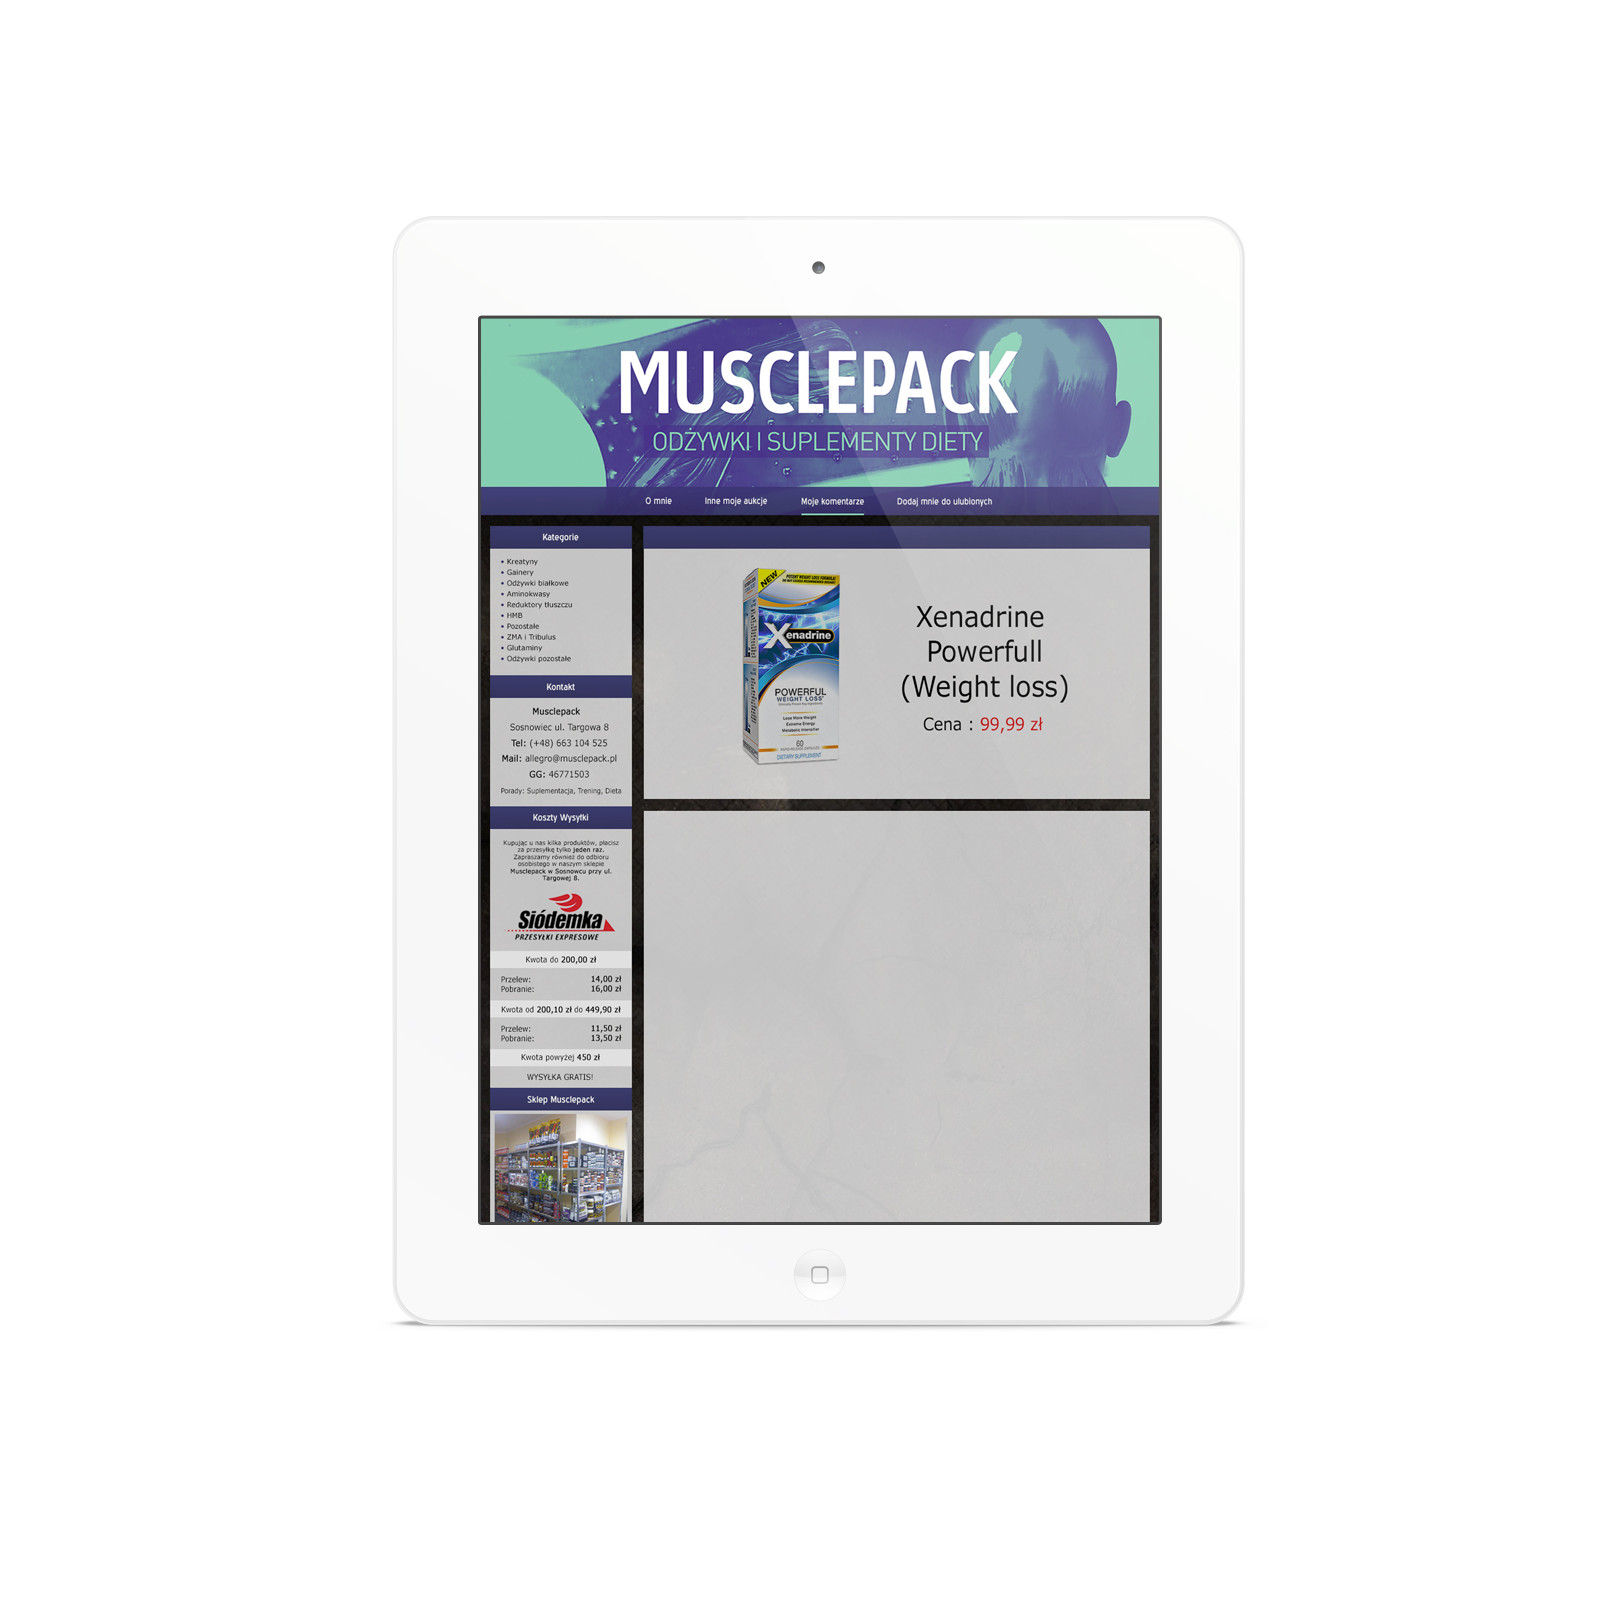 Musclepack